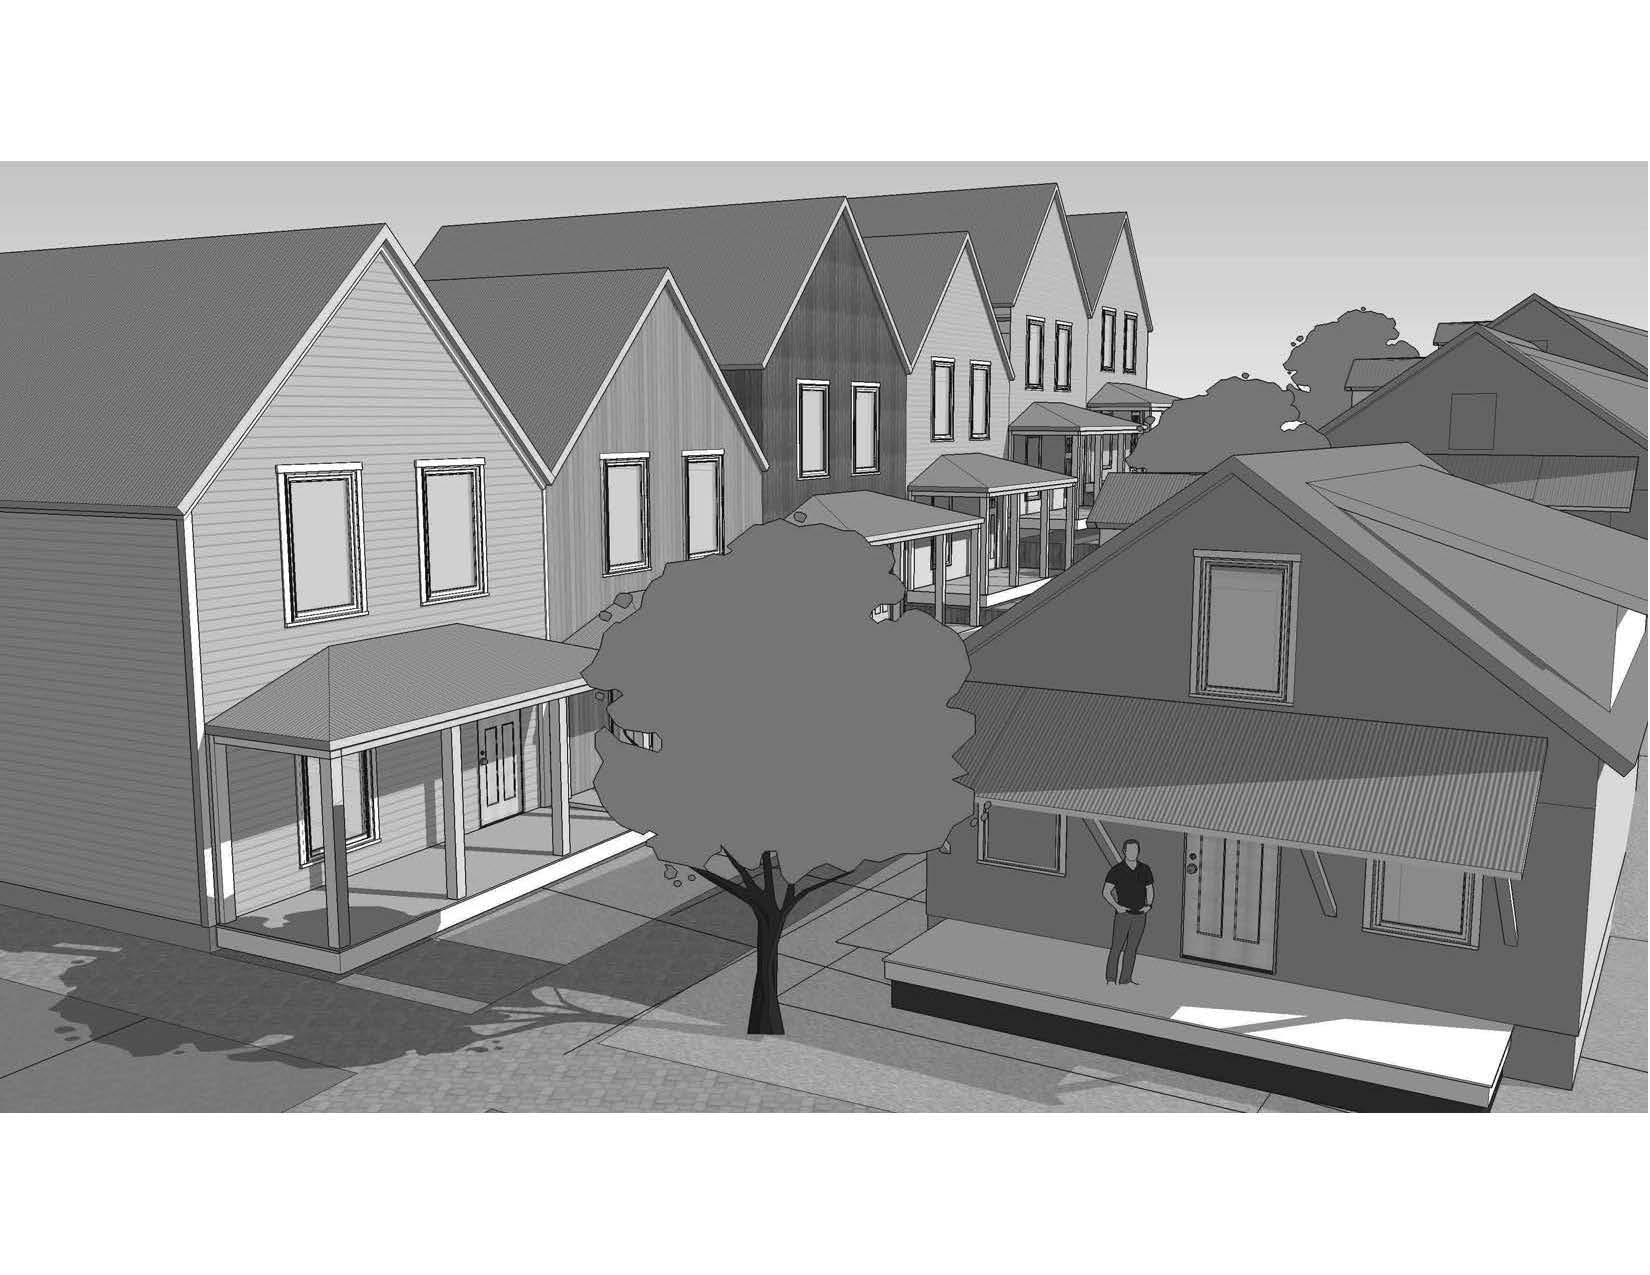 1712 brigham townhouse site rendered 9-1-2017 B&W 1_Page_2.jpg